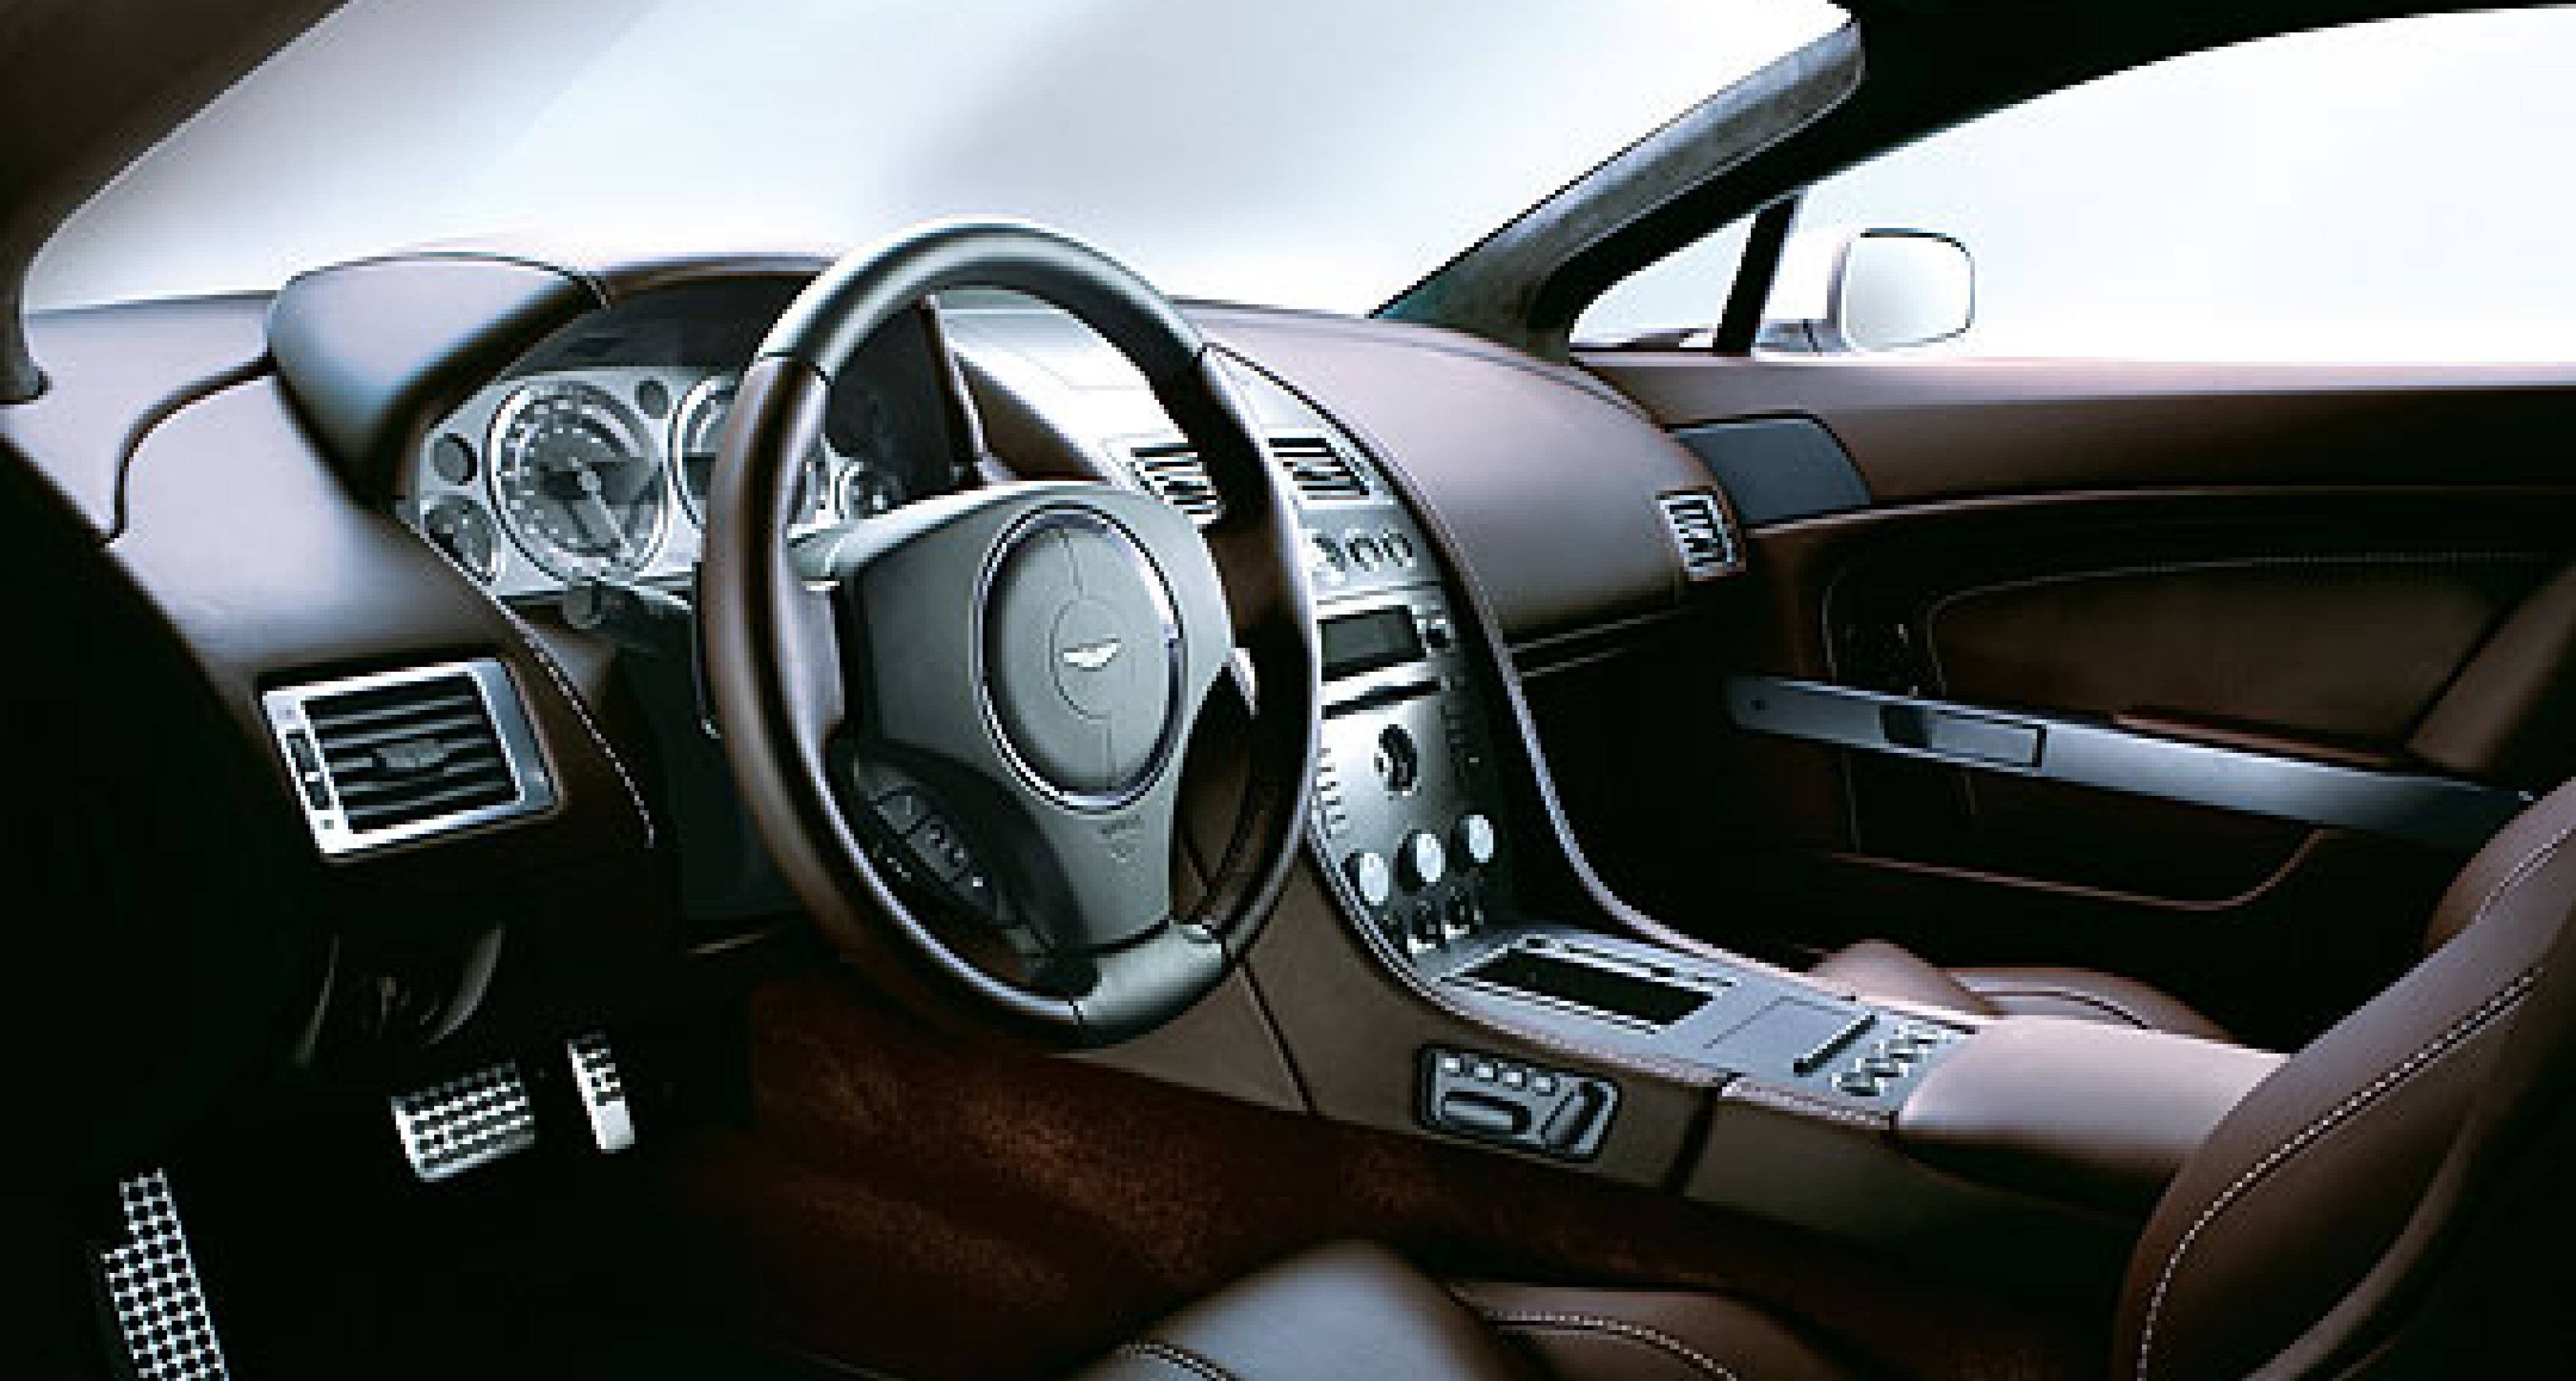 New 'Sportshift' Transmission for Aston Martin V8 Vantage